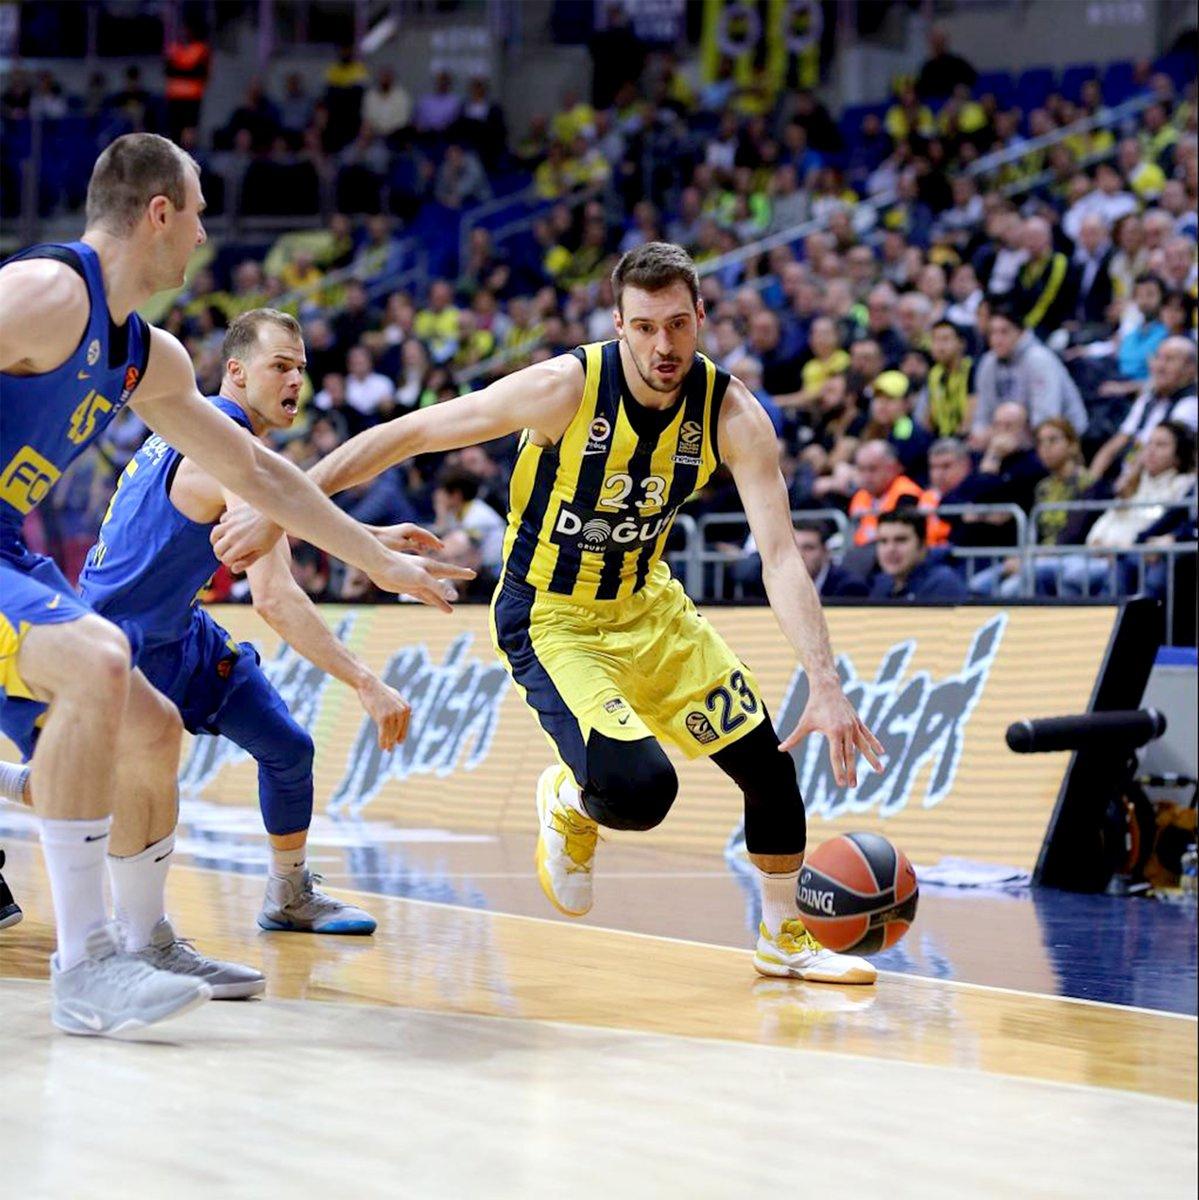 Fenerbahçe Doğuş, Maccabi Fox